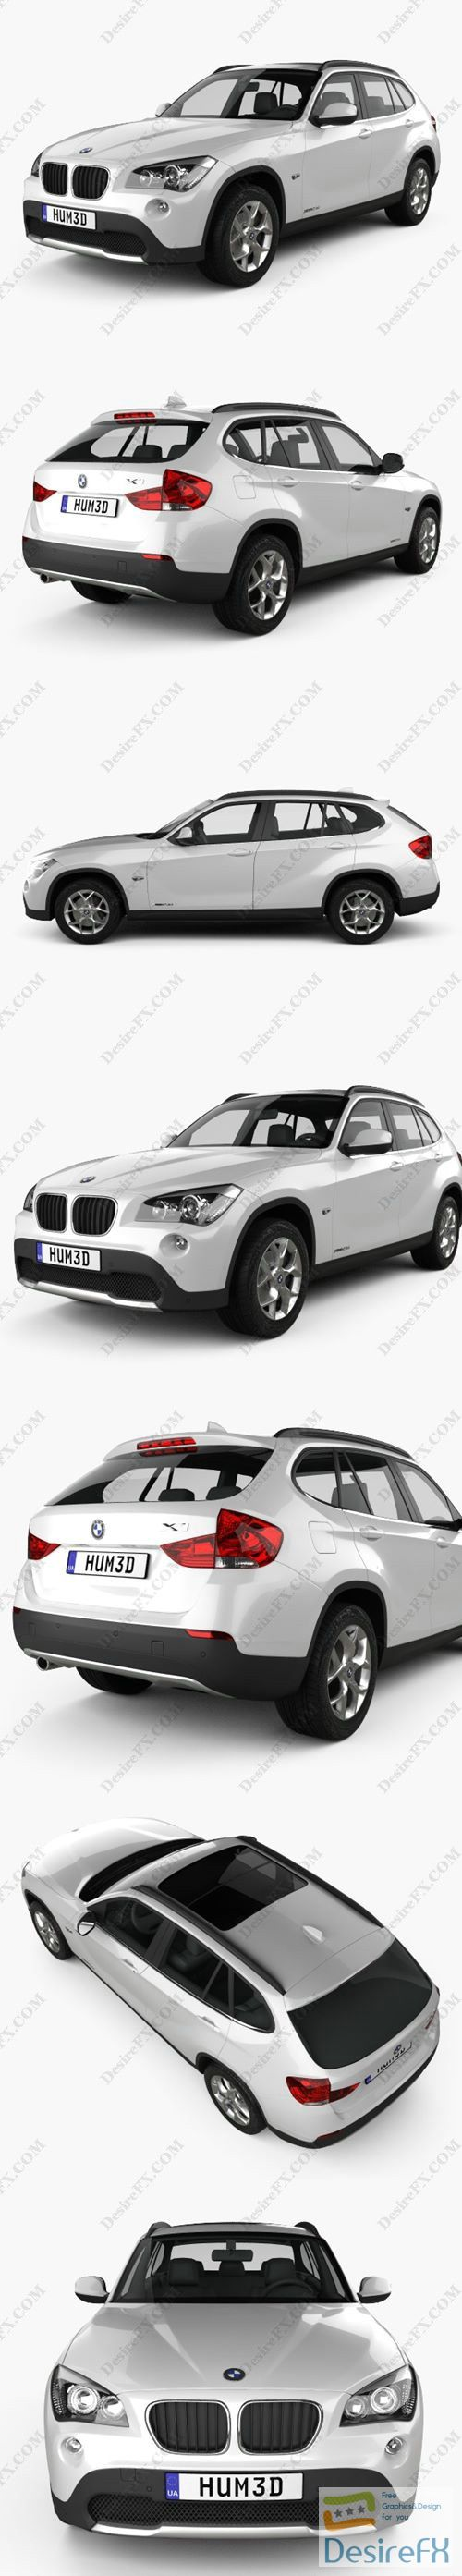 BMW X1 2010 3D Model